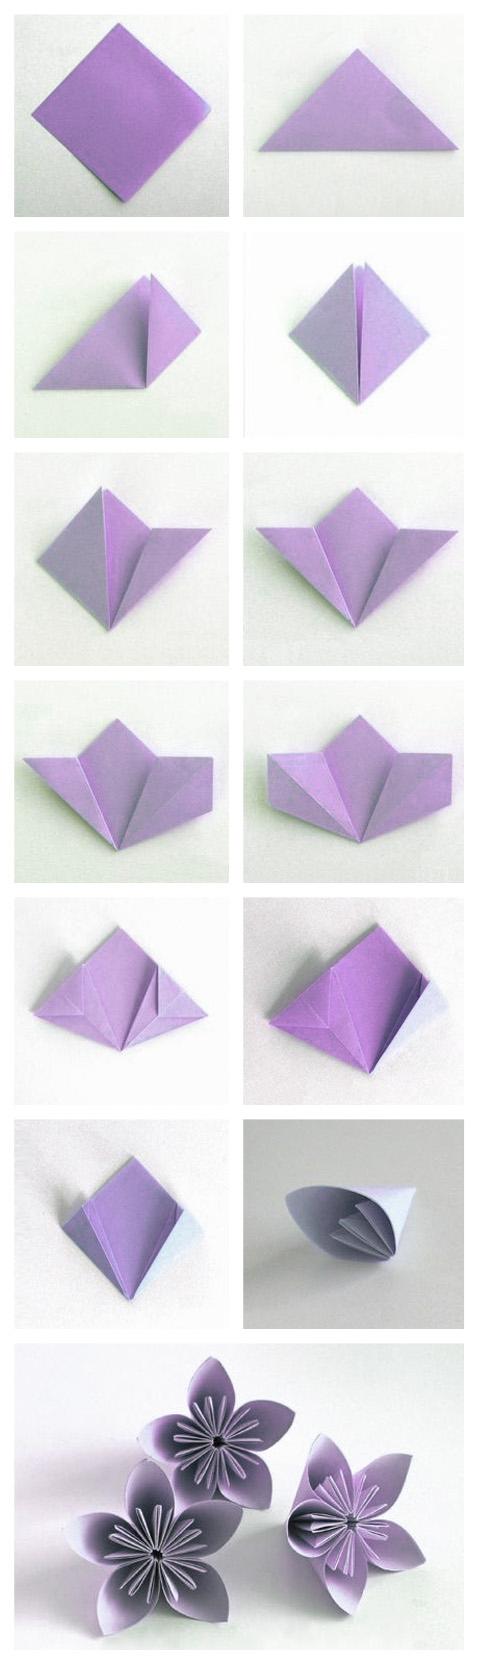 Diy Z Dekoria Pl Embroidered Towels Origami Crafts